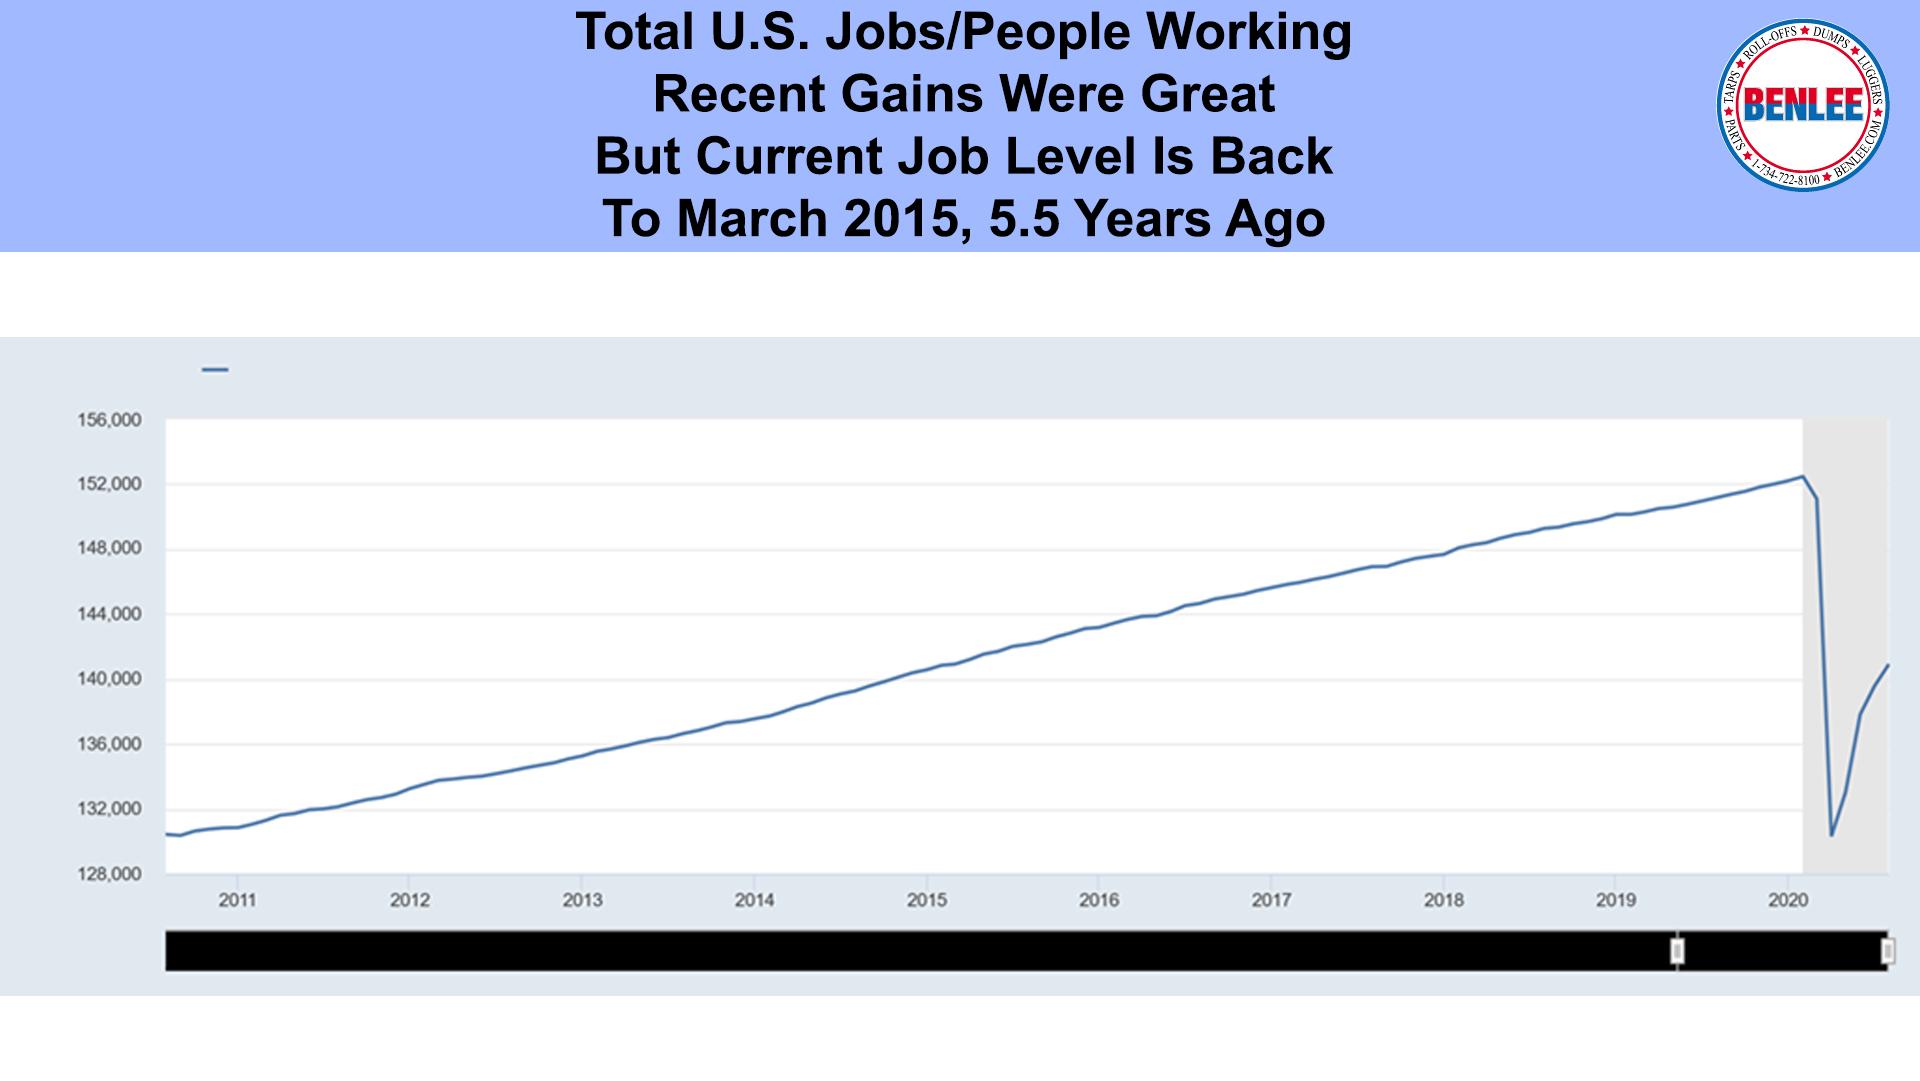 Total U.S. Jobs